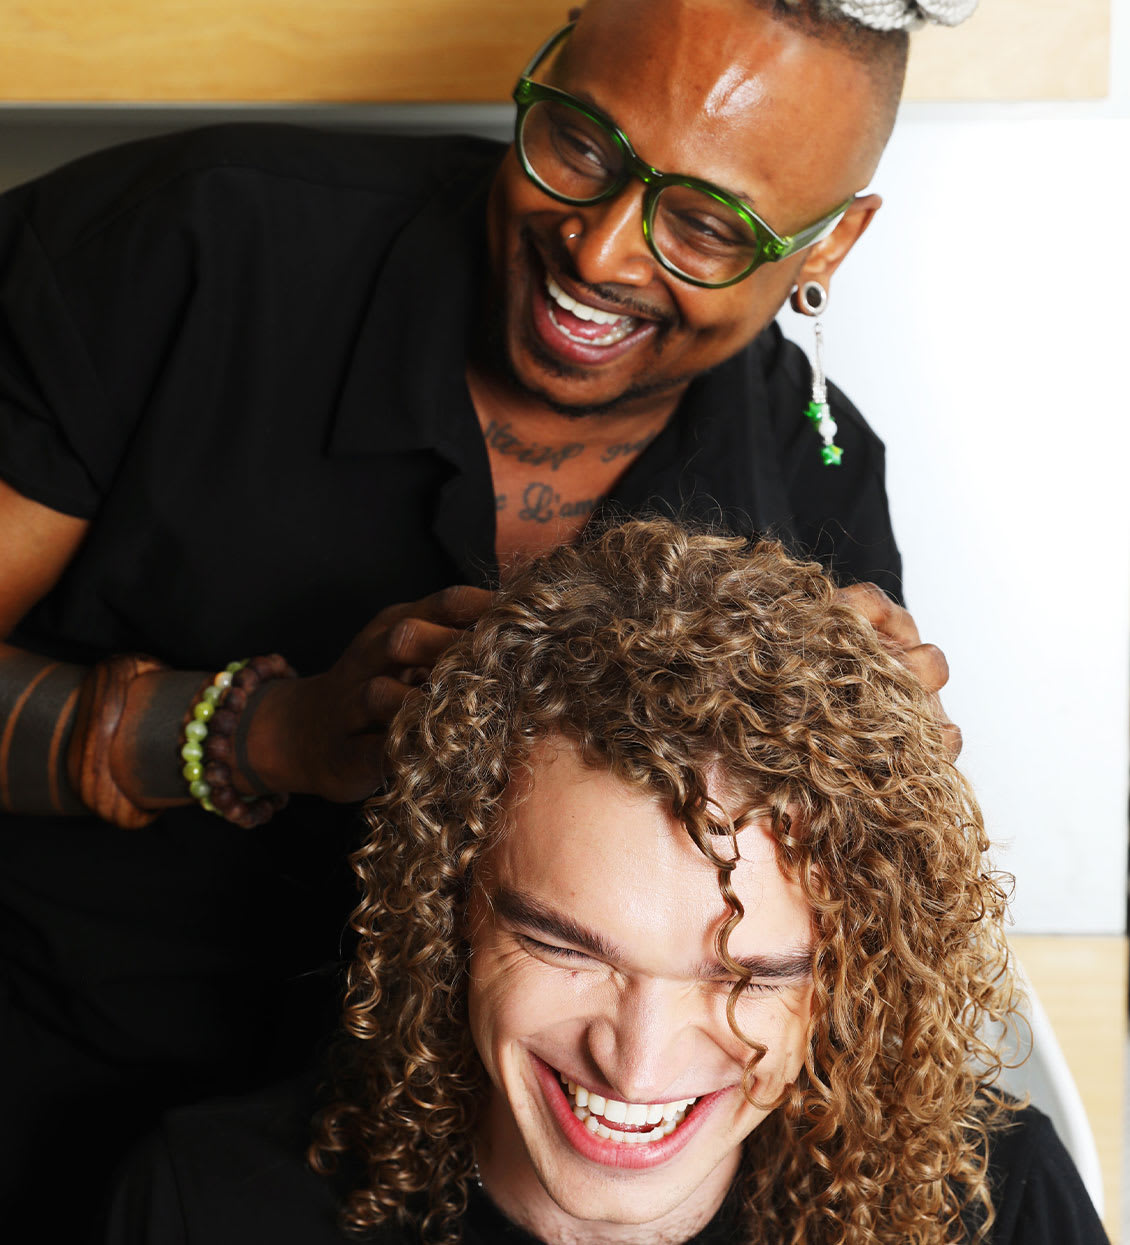 hair stylist fluffing curly hair